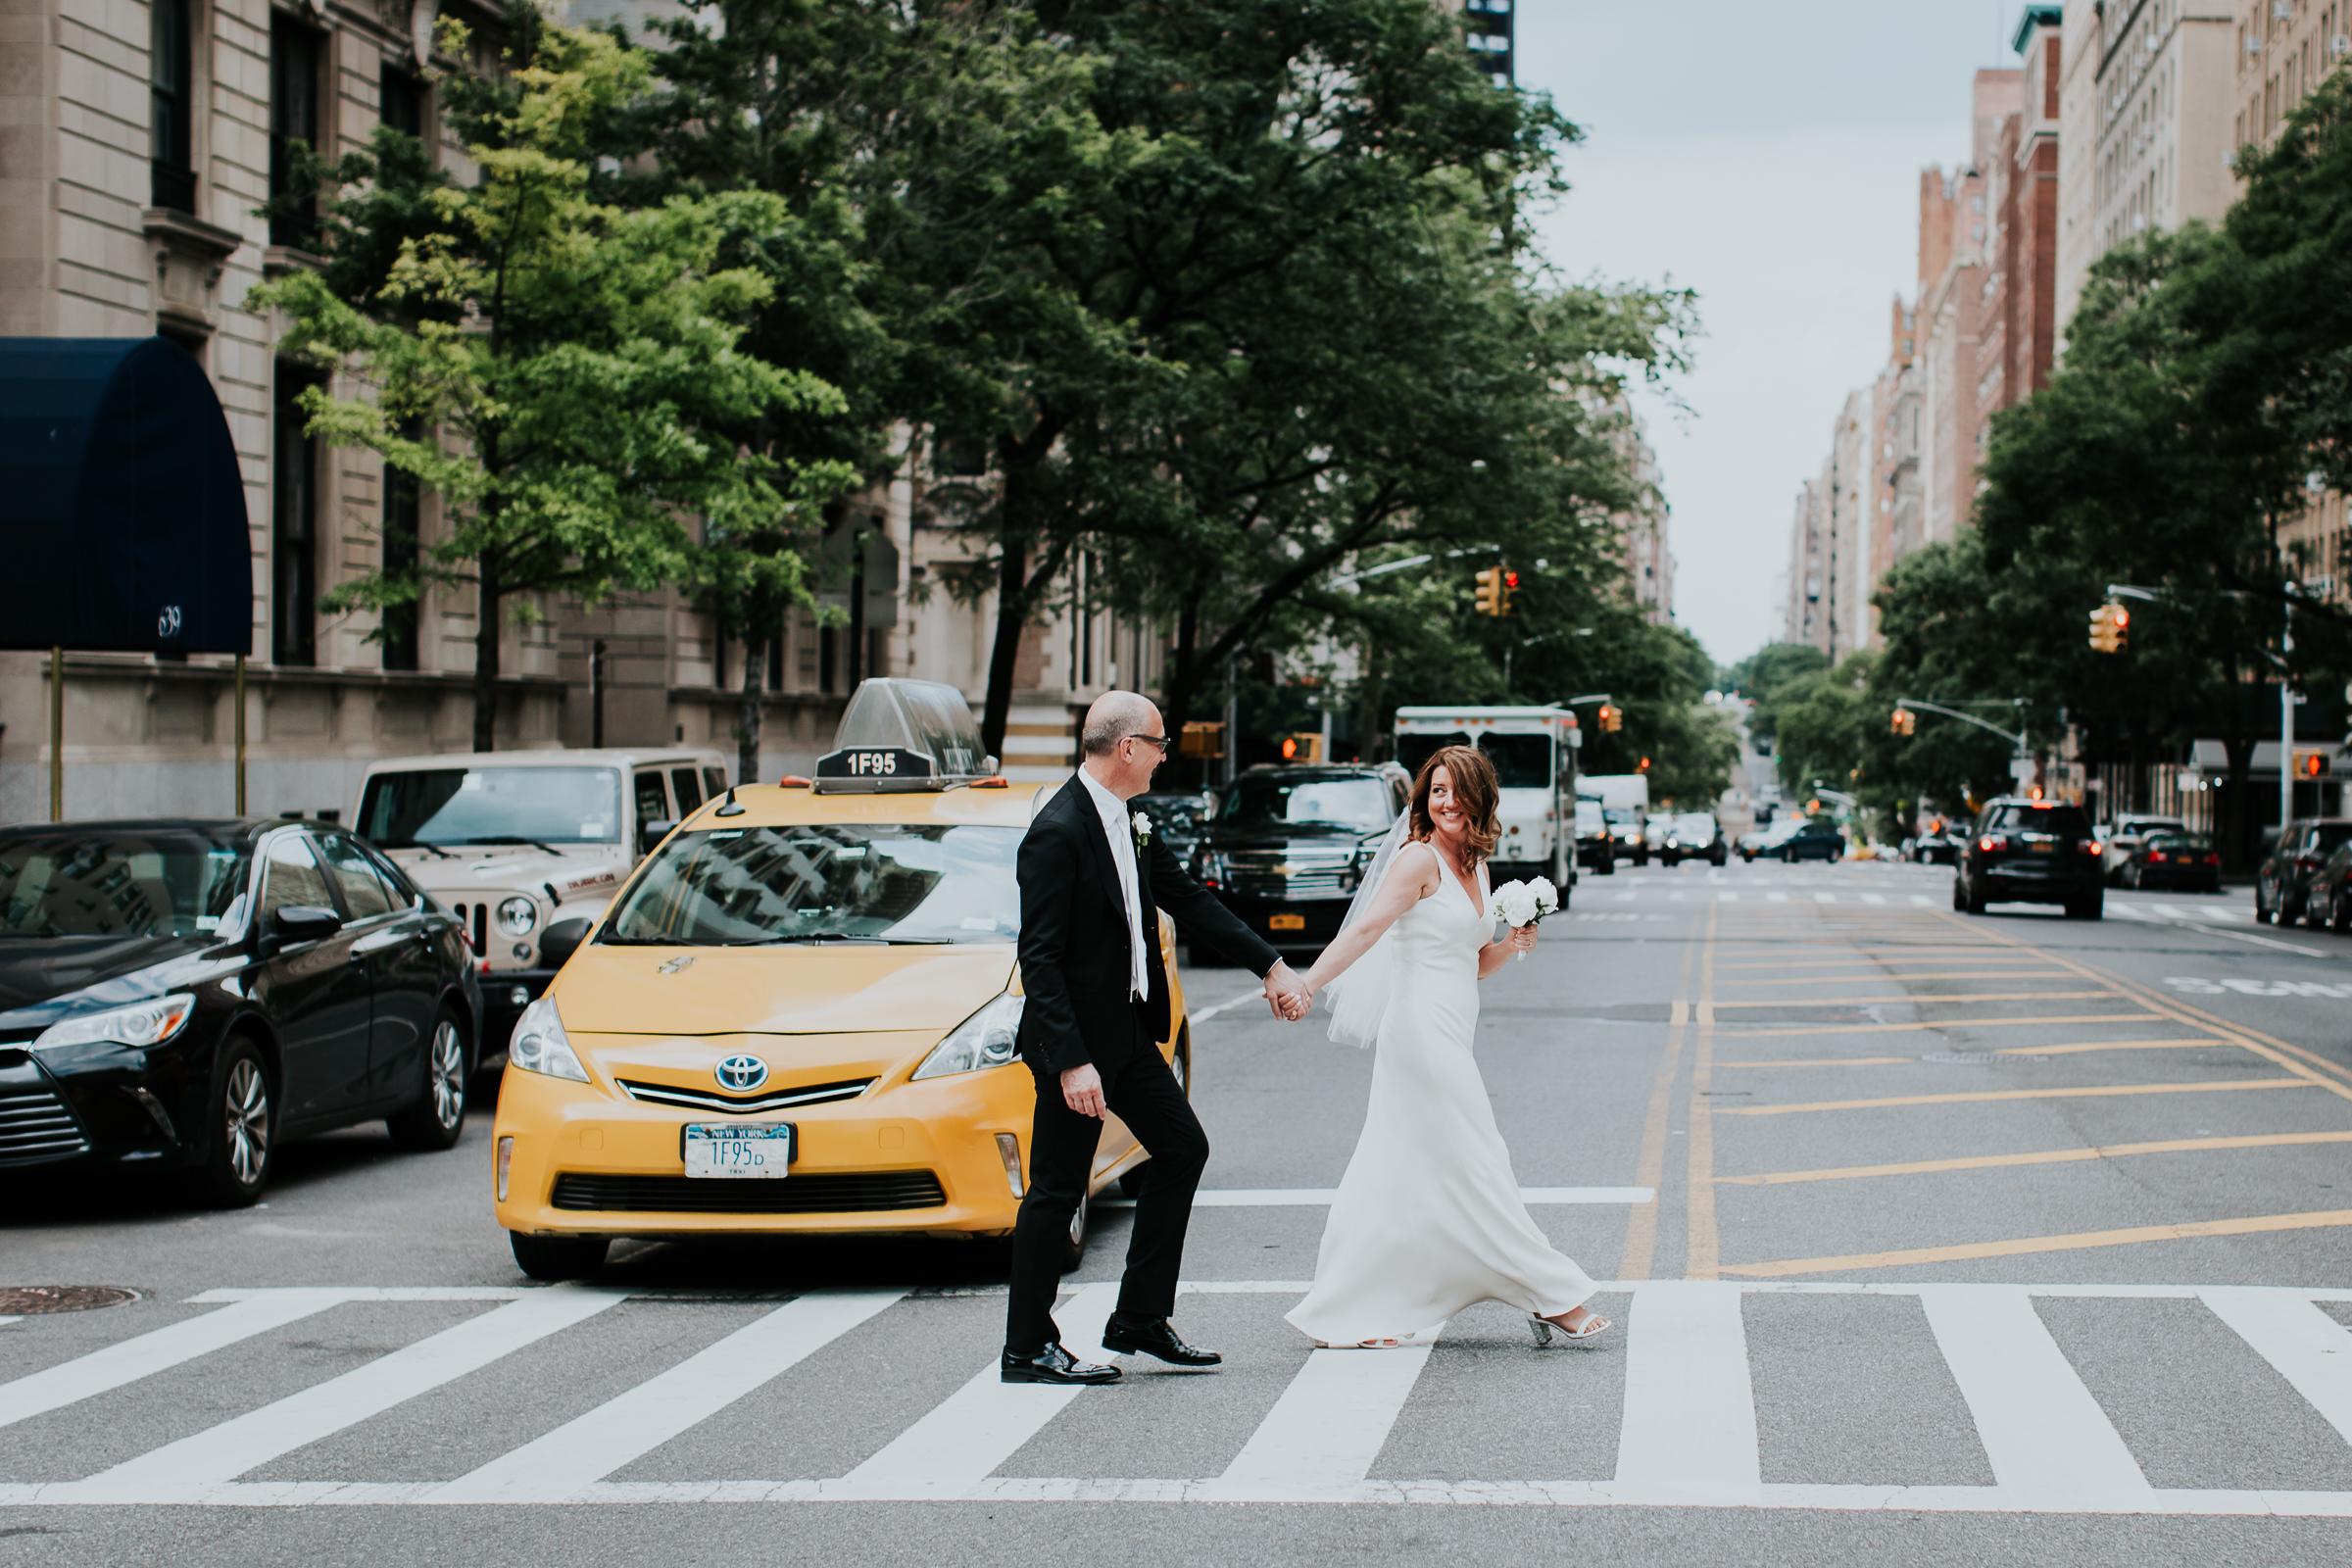 New-York-Documentary-Wedding-Photography-Best-Of-2017-by-Elvira-Kalviste-Photography-101.jpg